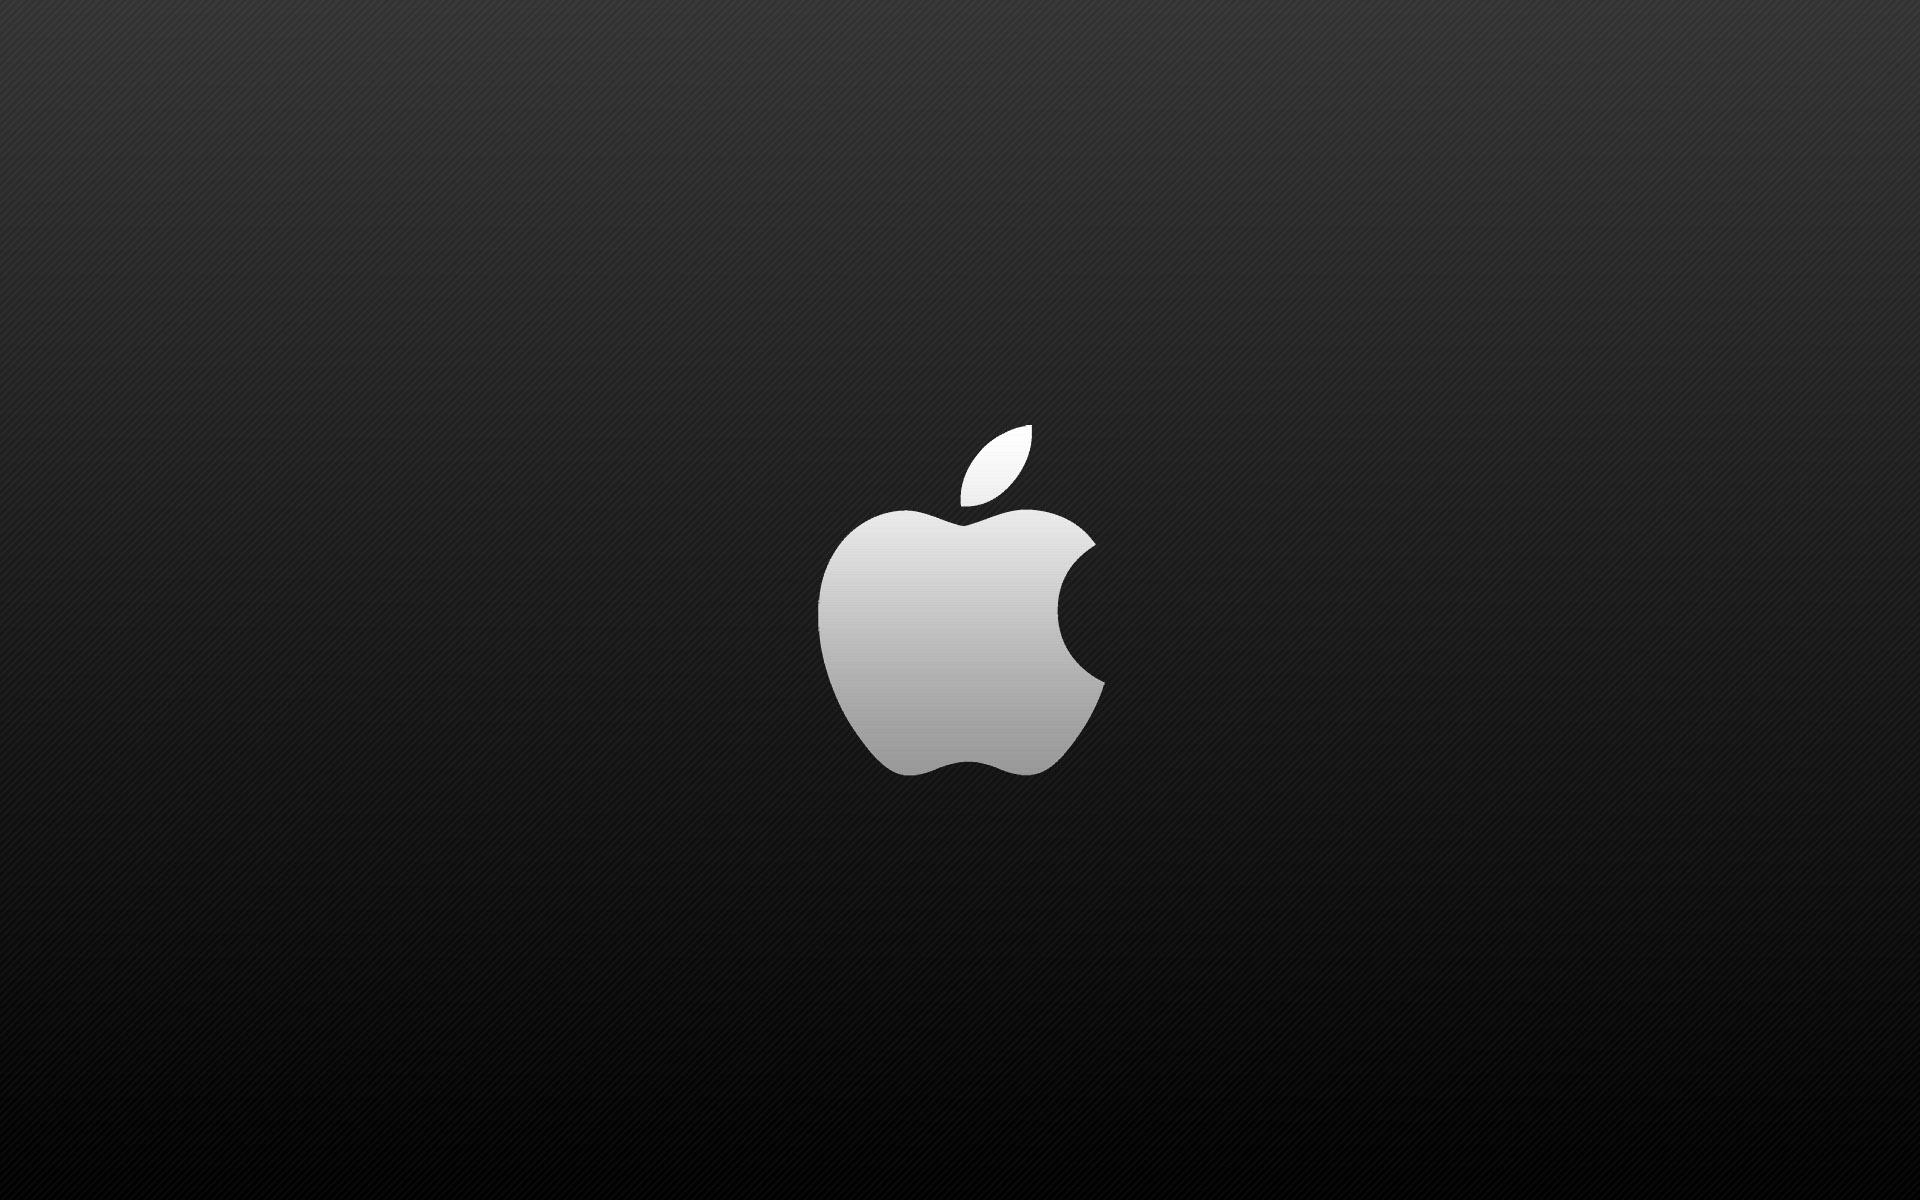 Logo Cool Background Apple Photo Full HD desktop wallpaper 1920x1200